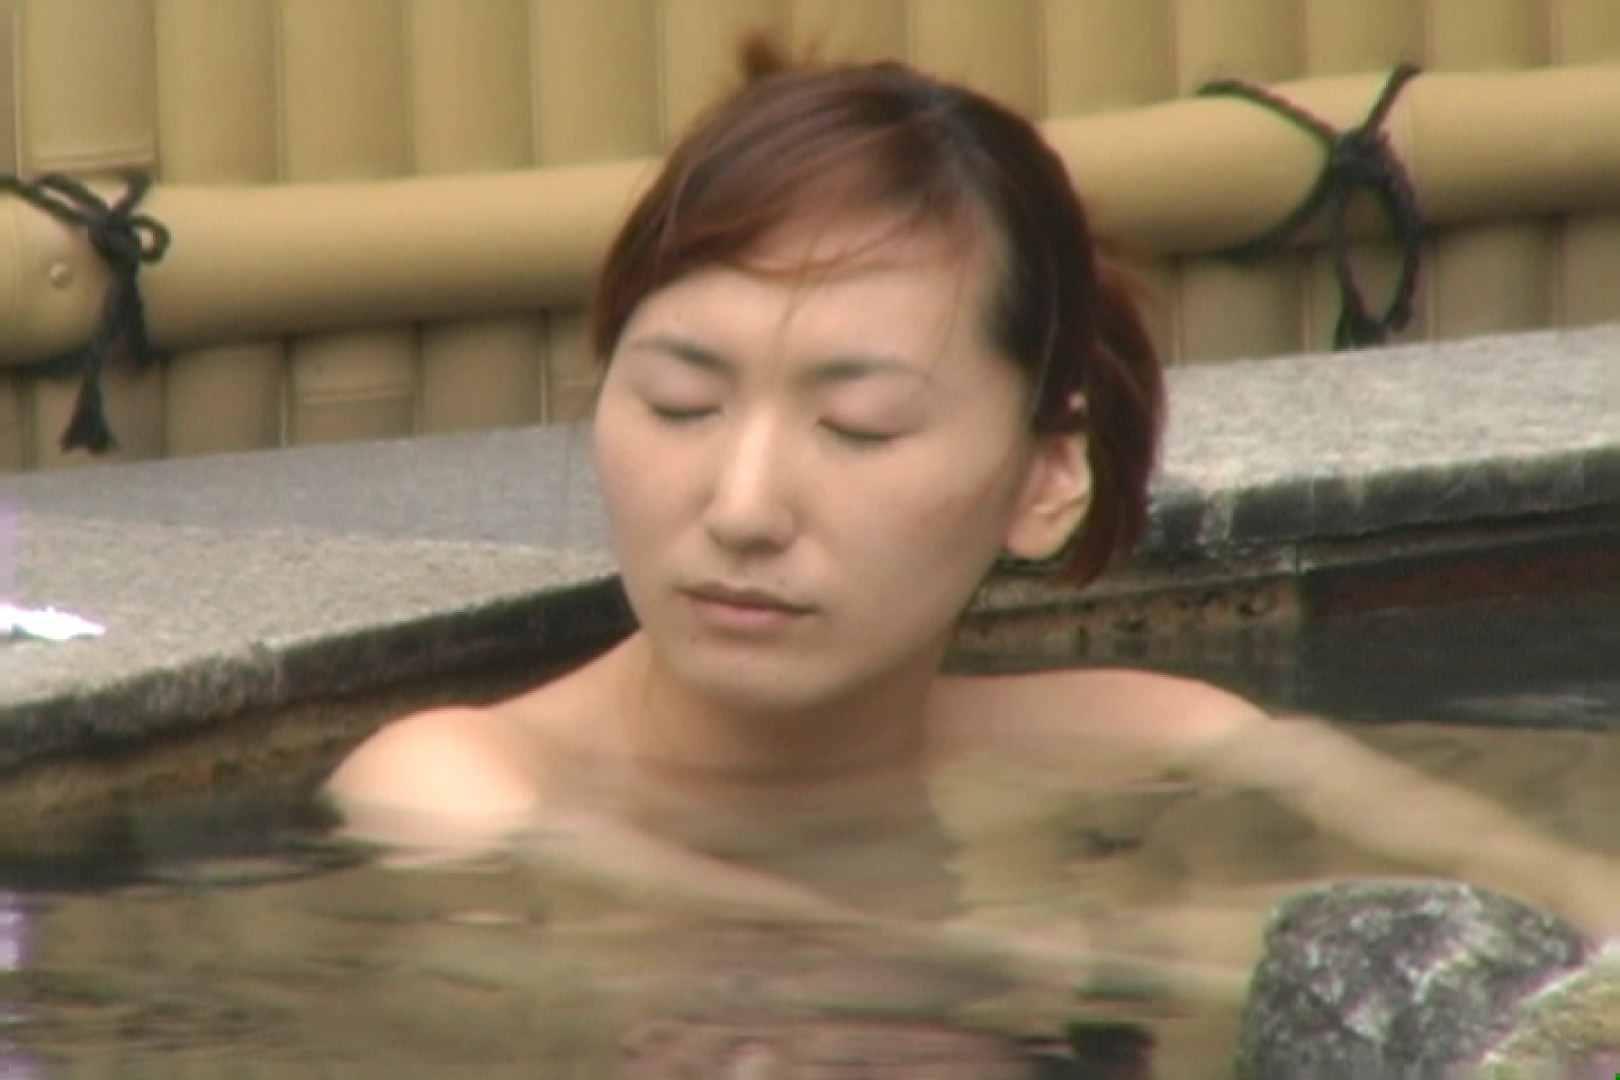 Aquaな露天風呂Vol.616 露天   OLセックス  99画像 55